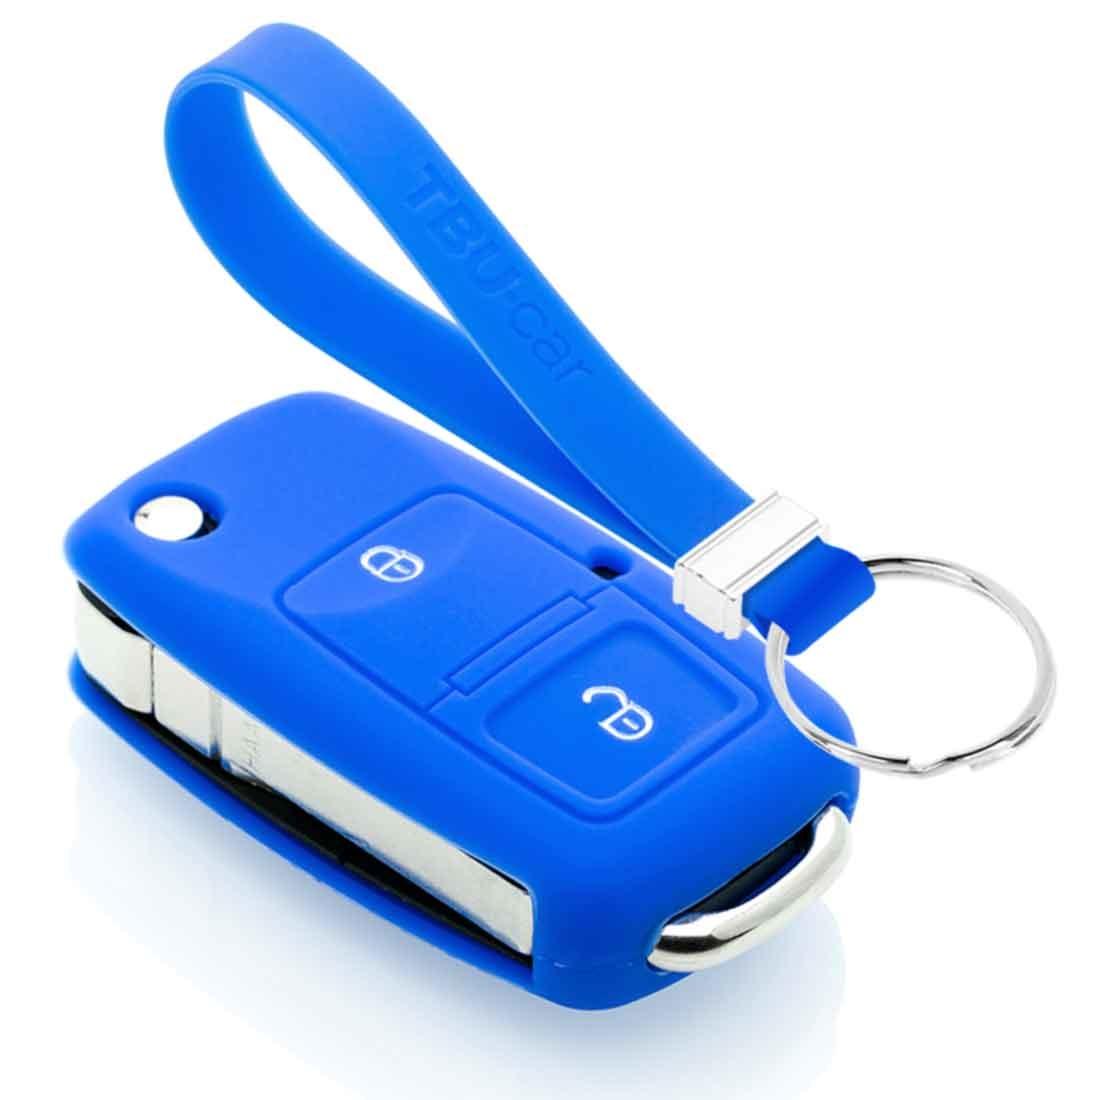 TBU car TBU car Sleutel cover compatibel met Skoda - Silicone sleutelhoesje - beschermhoesje autosleutel - Blauw